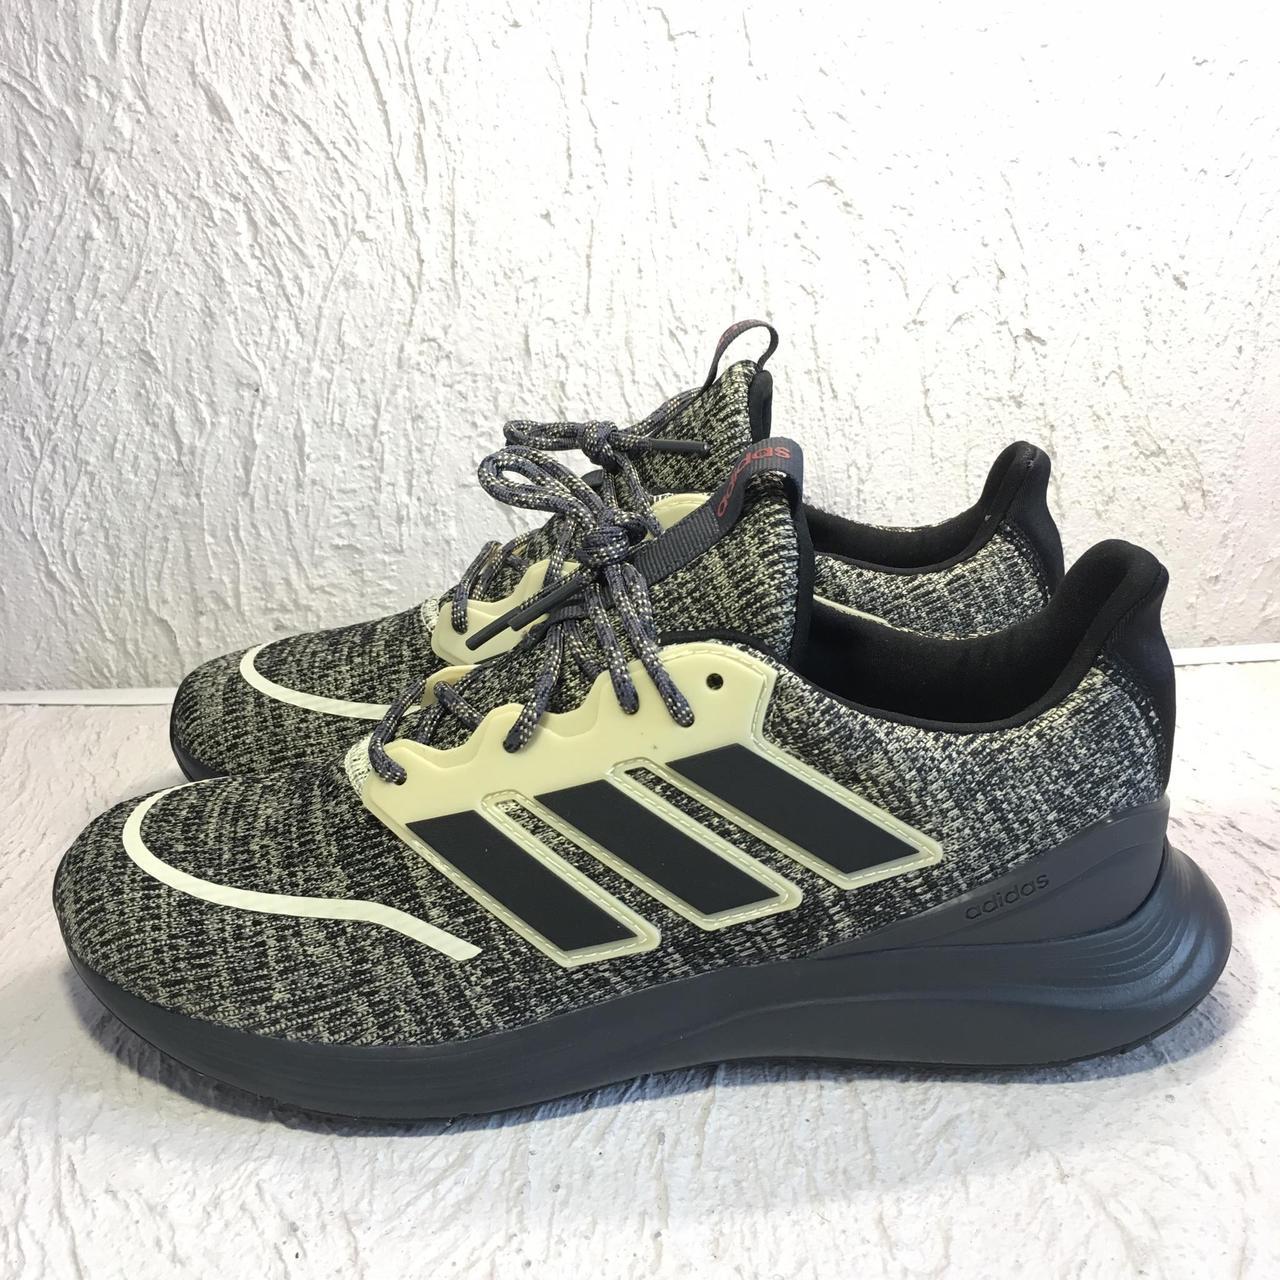 Кроссовки для бега Adidas Energyfalcon EG8389 42, 42 2/3, 44, 44 2/3 размер